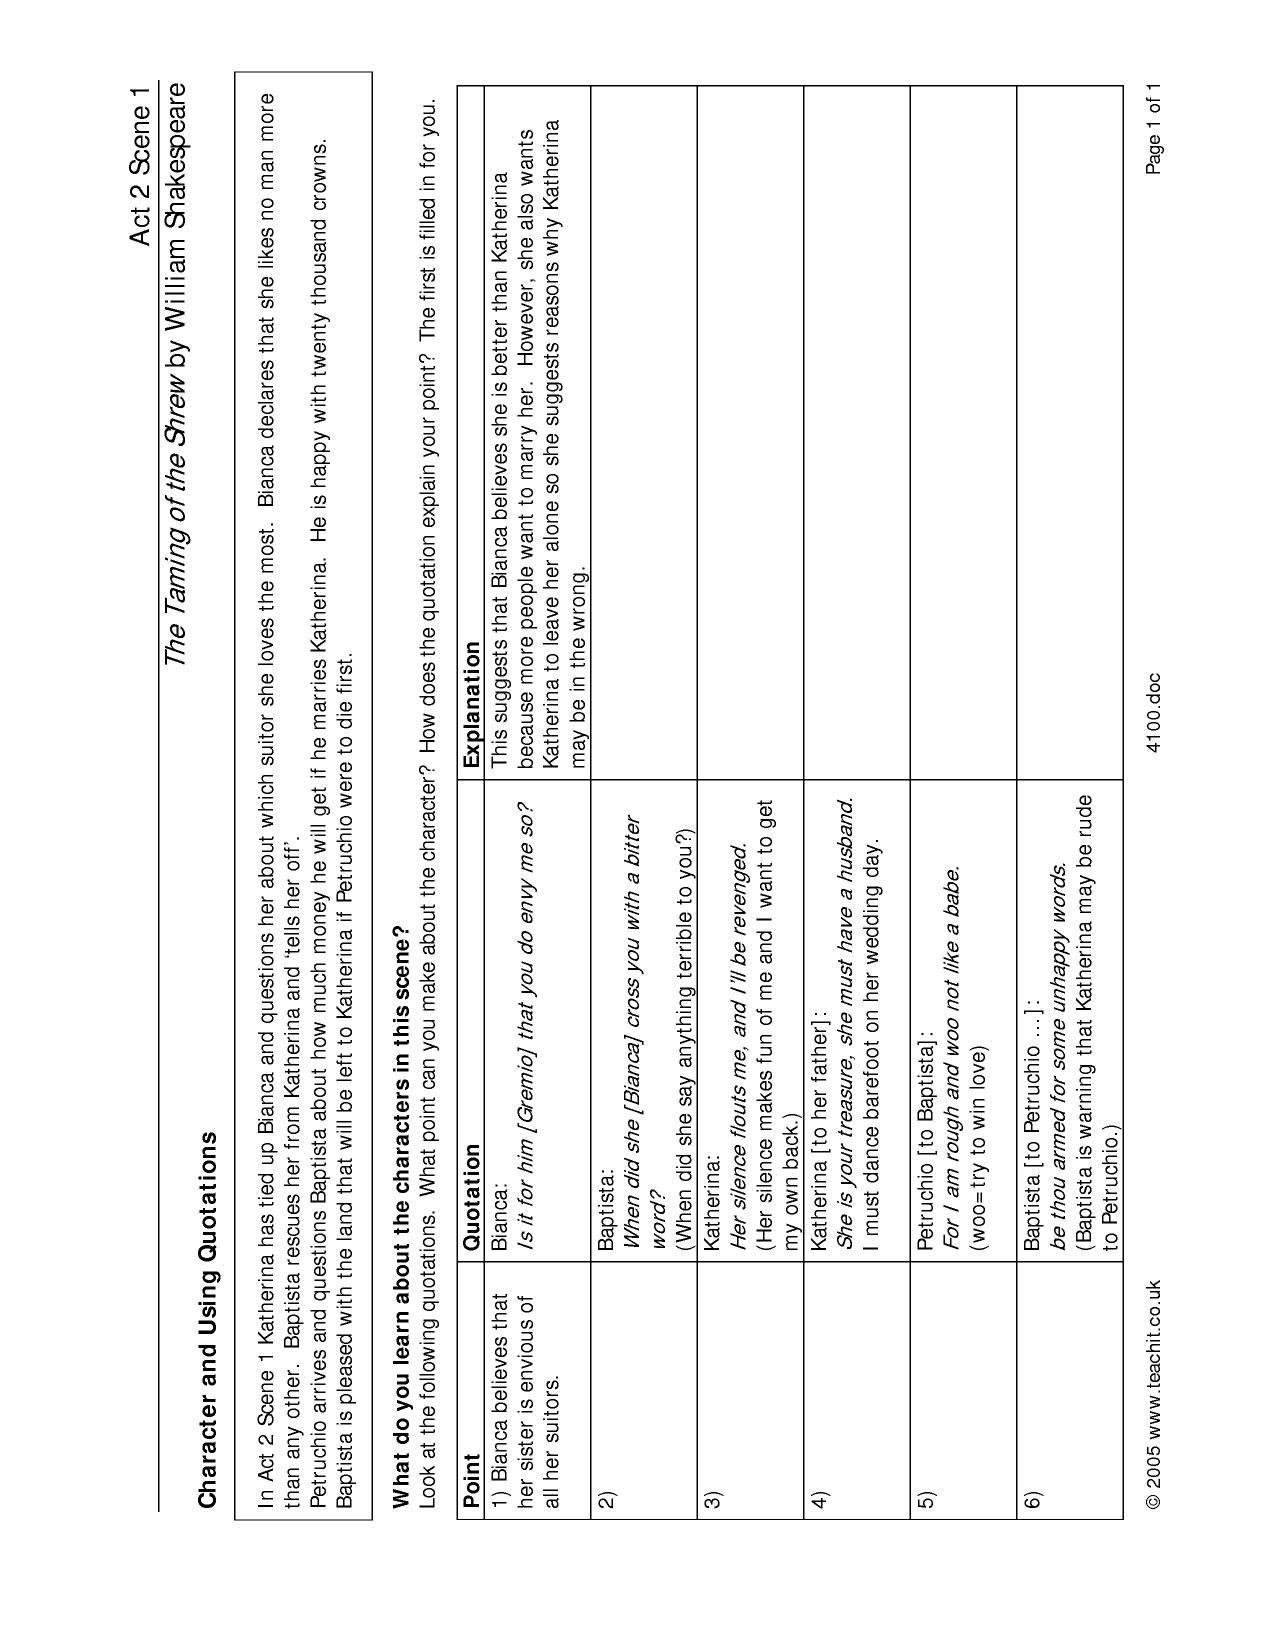 buy essay online taming of the shrew essay questions roger taming of the shrew essay questions